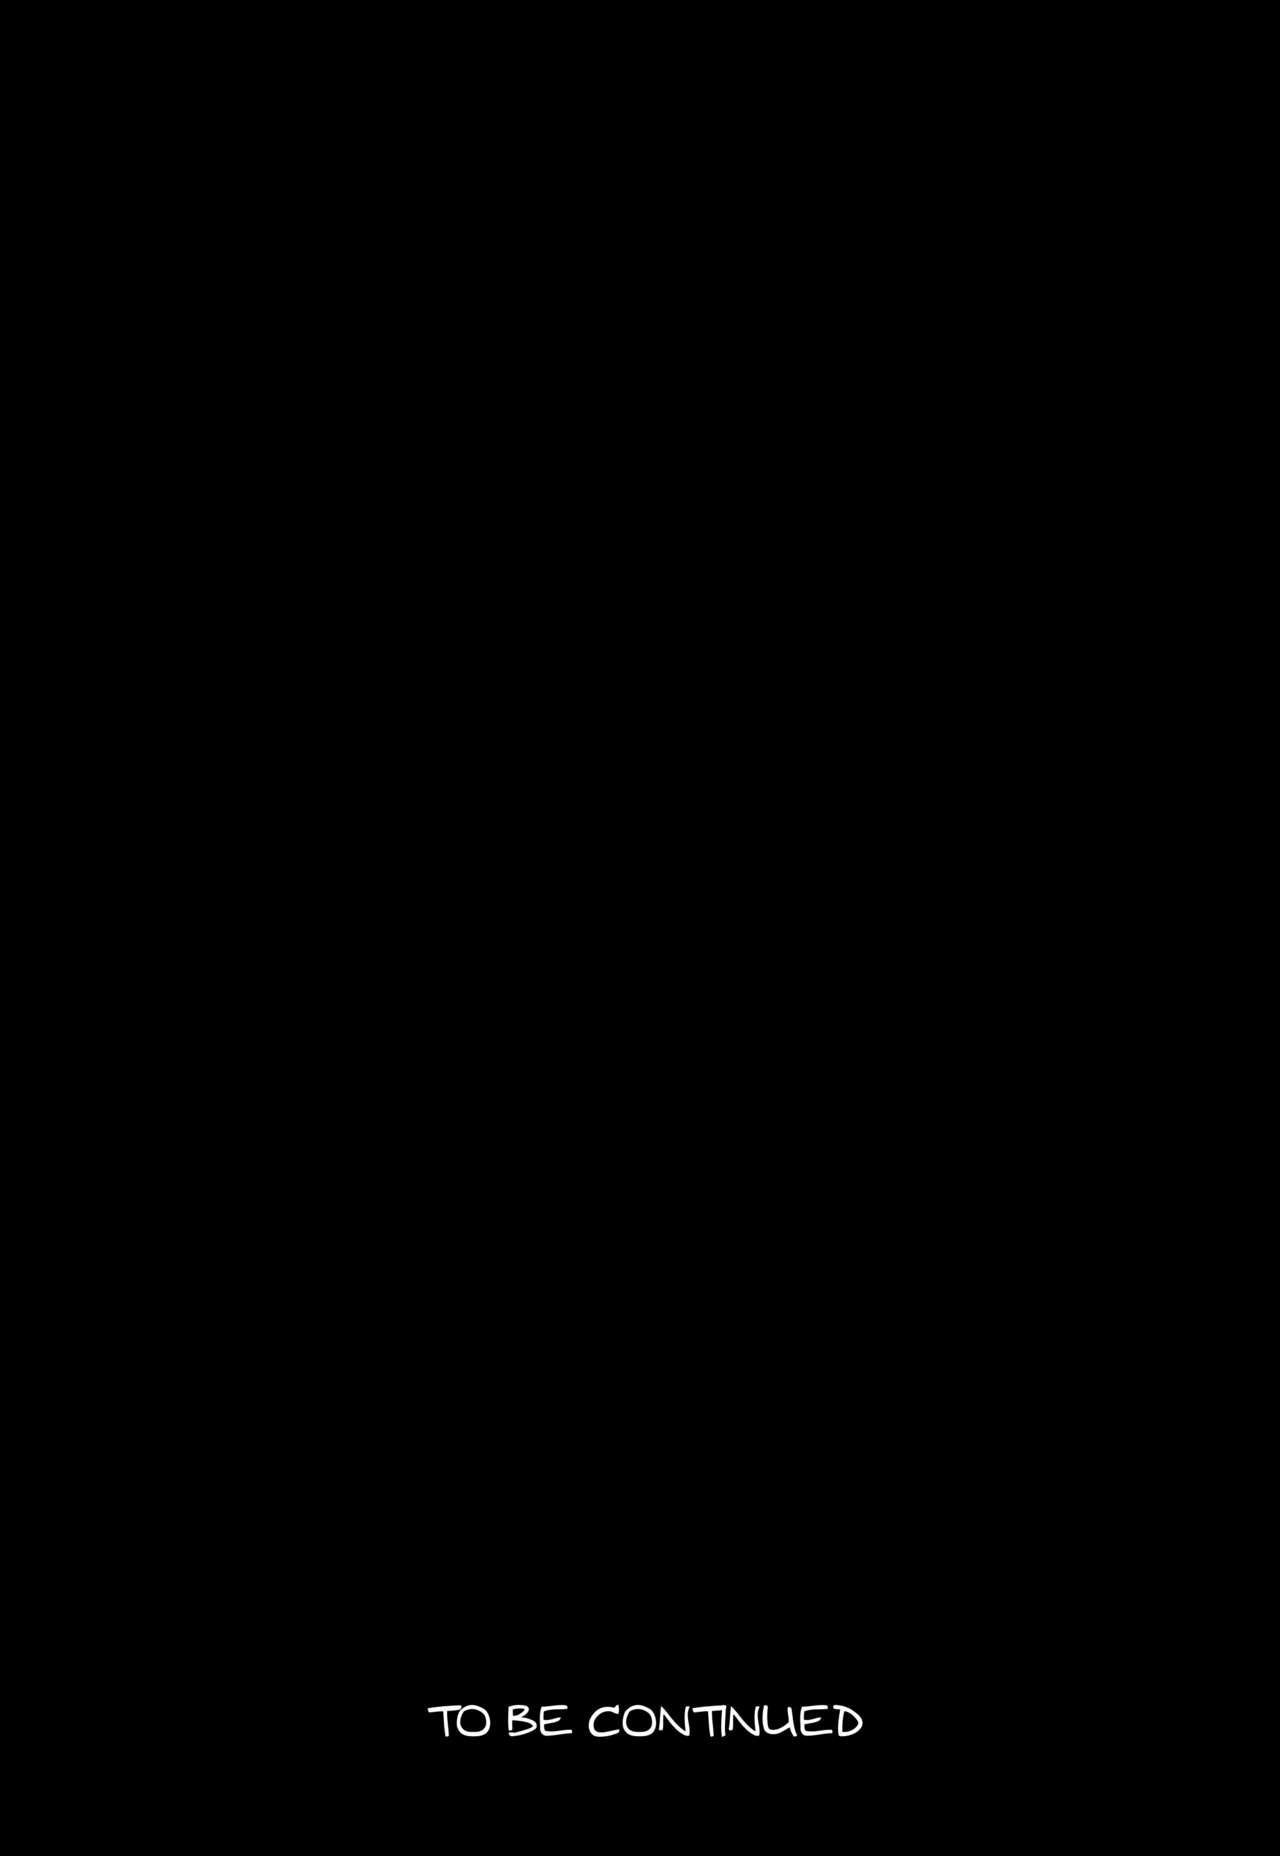 [Eromazun (Ma-Kurou)] Saint Helena Gakuen 2 ~ Terrorist ni Senkyosareta Jogakuen de Rape Matsuri!~   Saint Helena Academy 2 ~A School Occupied by Terrorists Becomes a Rape Festival!~ (Various) [English] [B.E.C. Scans] 33